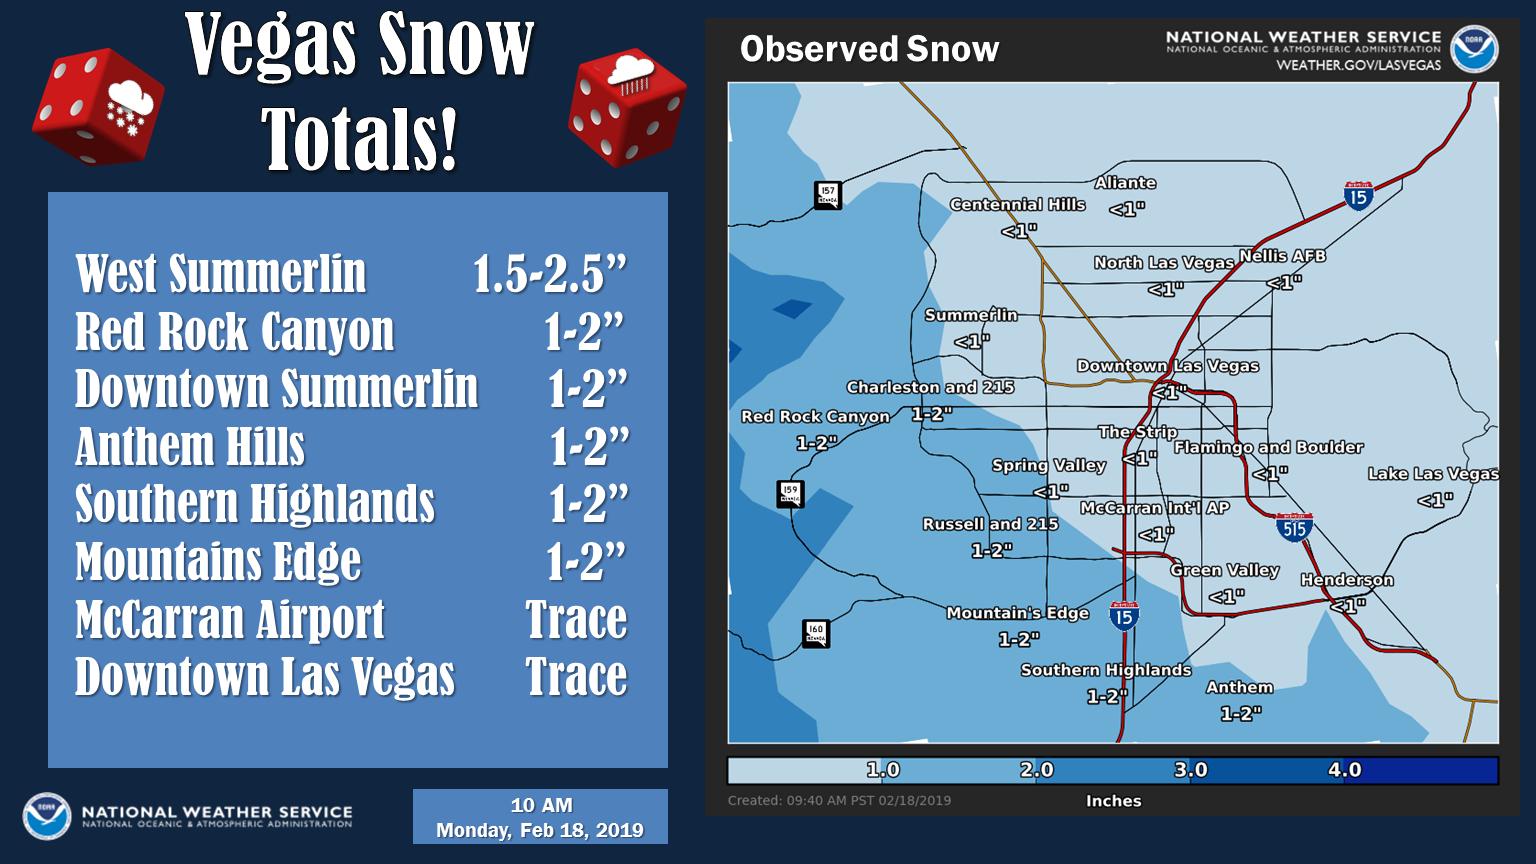 February 2019 Las Vegas Valley Snow Events